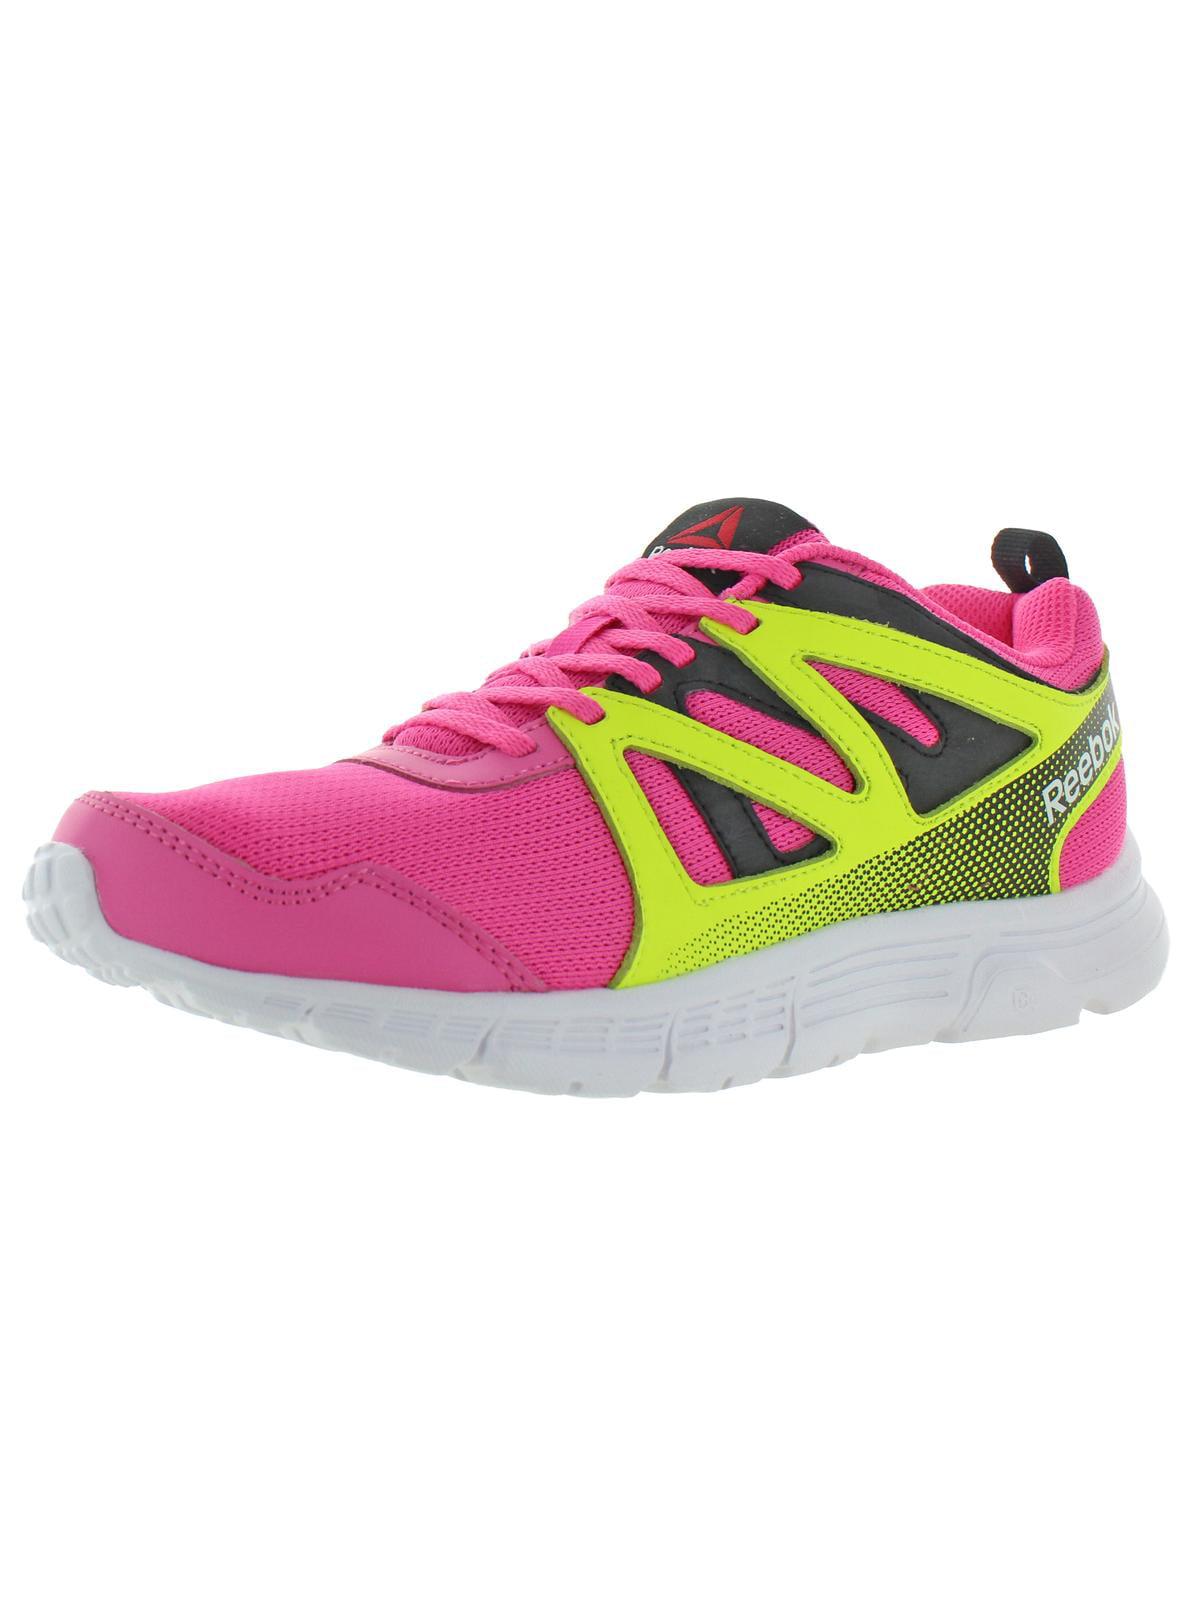 Reebok Girls Run Supreme 2.0 Athletic